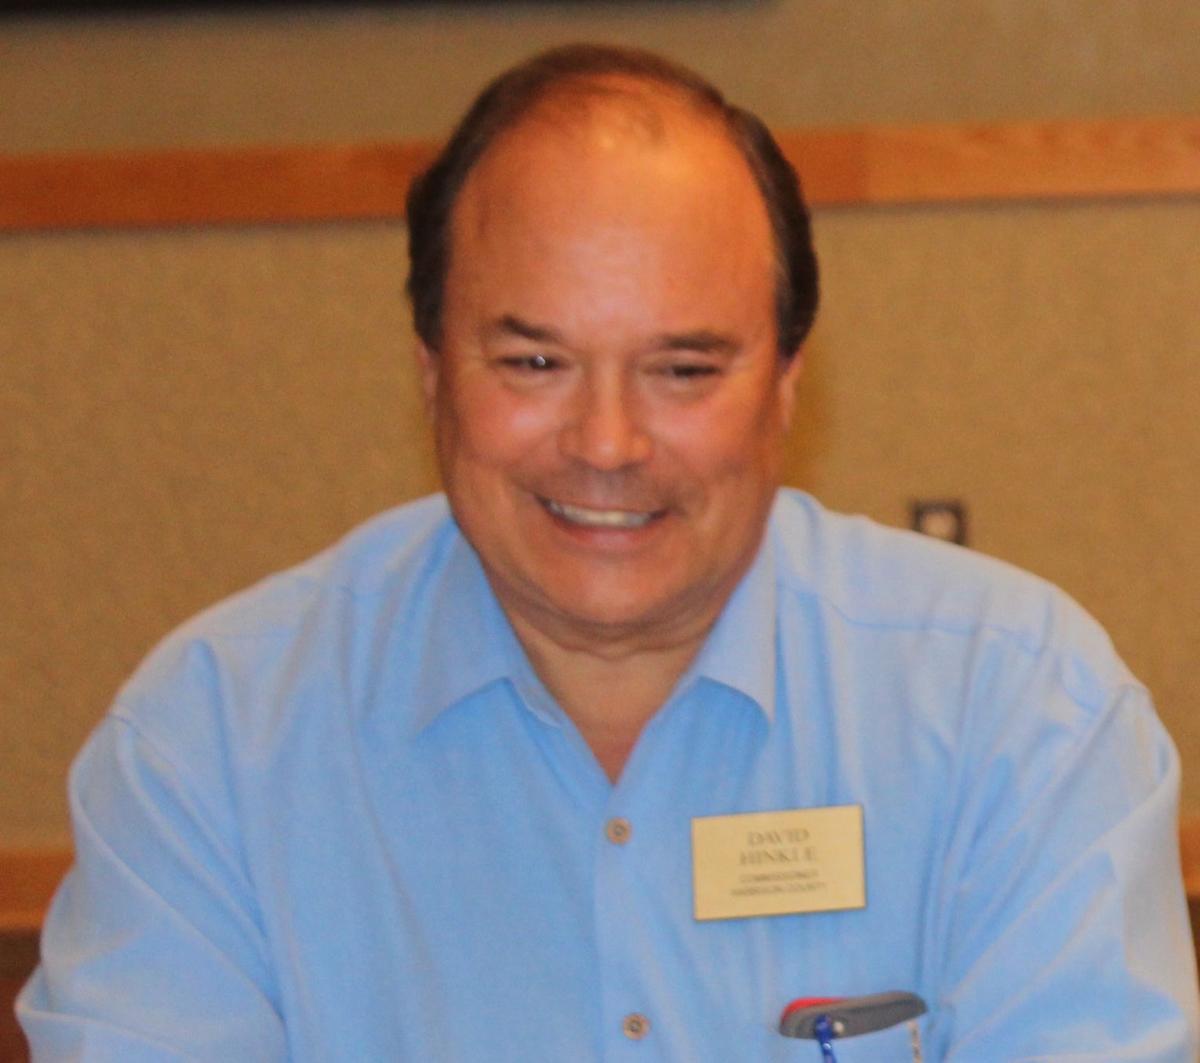 David Hinkle